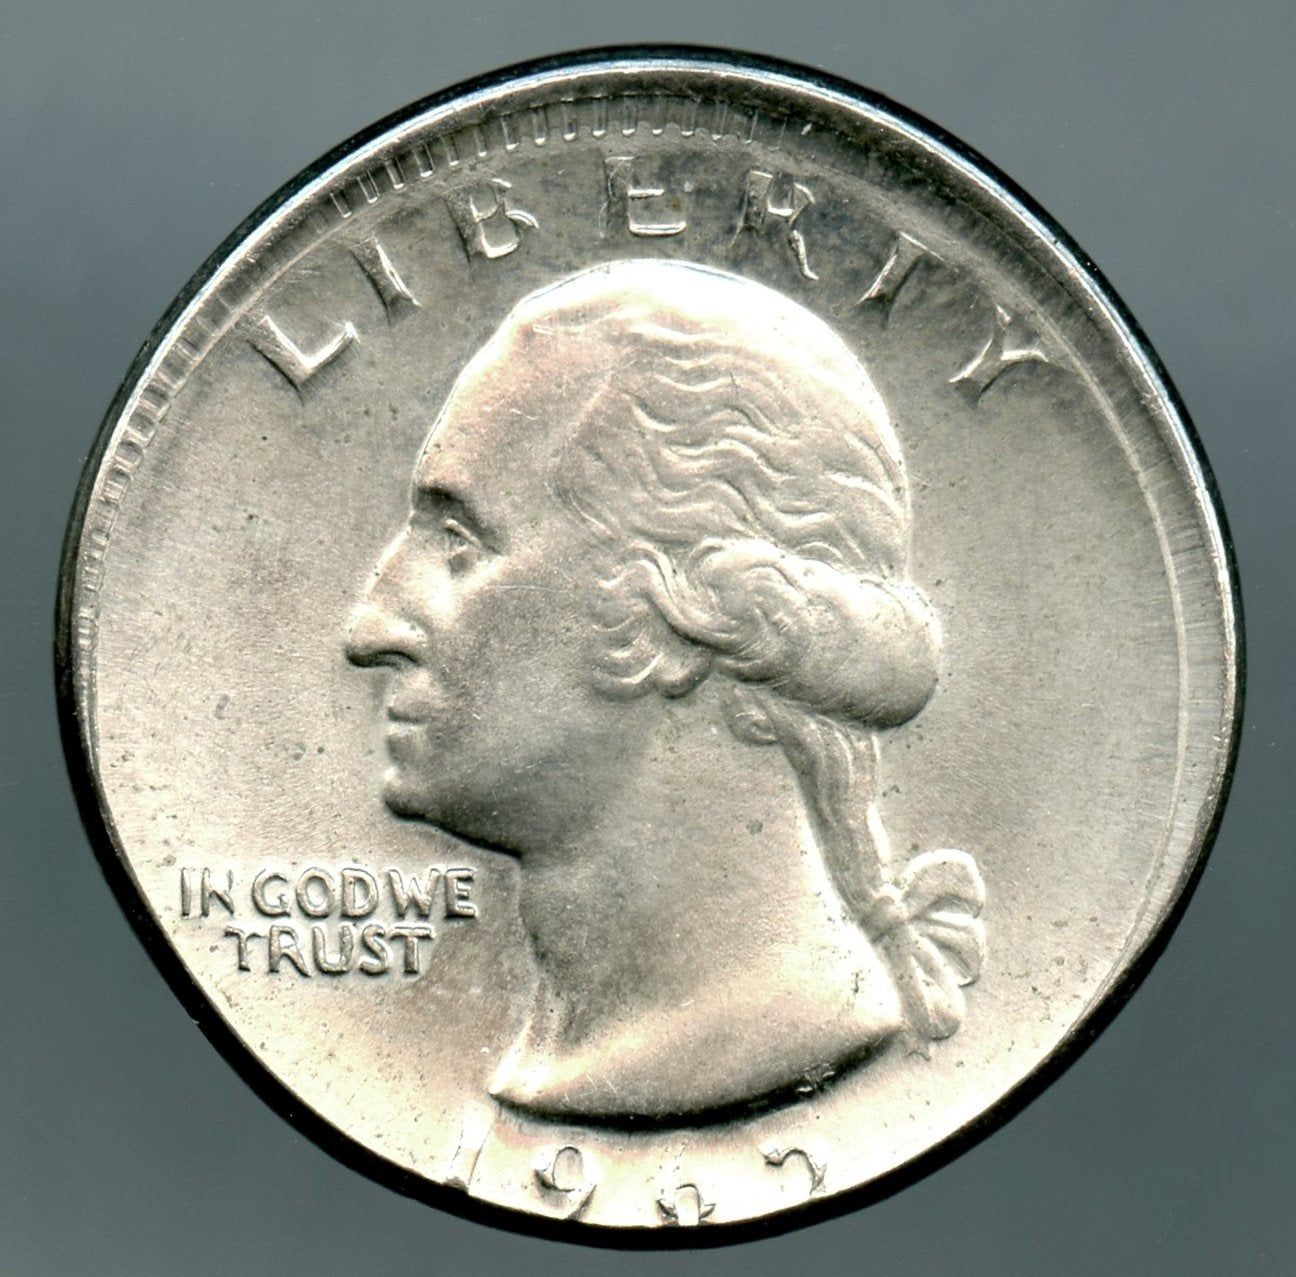 No 177 General Dollar Dansco Deluxe all in one Coin Folder